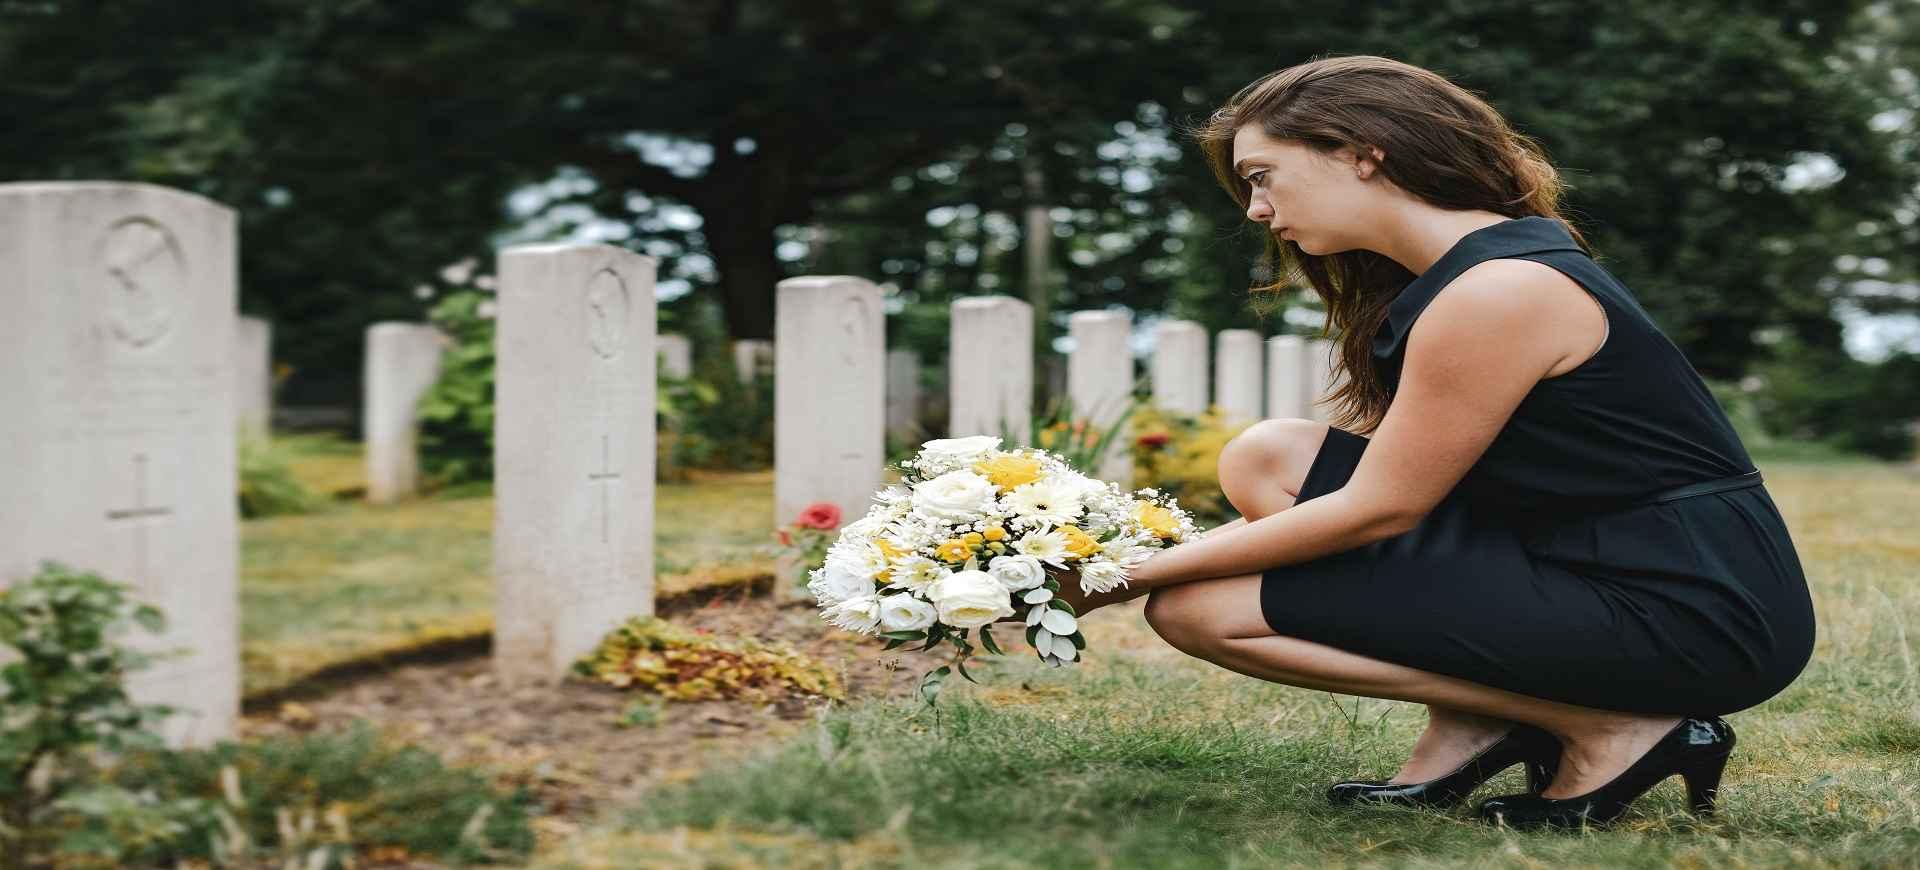 Widowhood benefits in life insurance